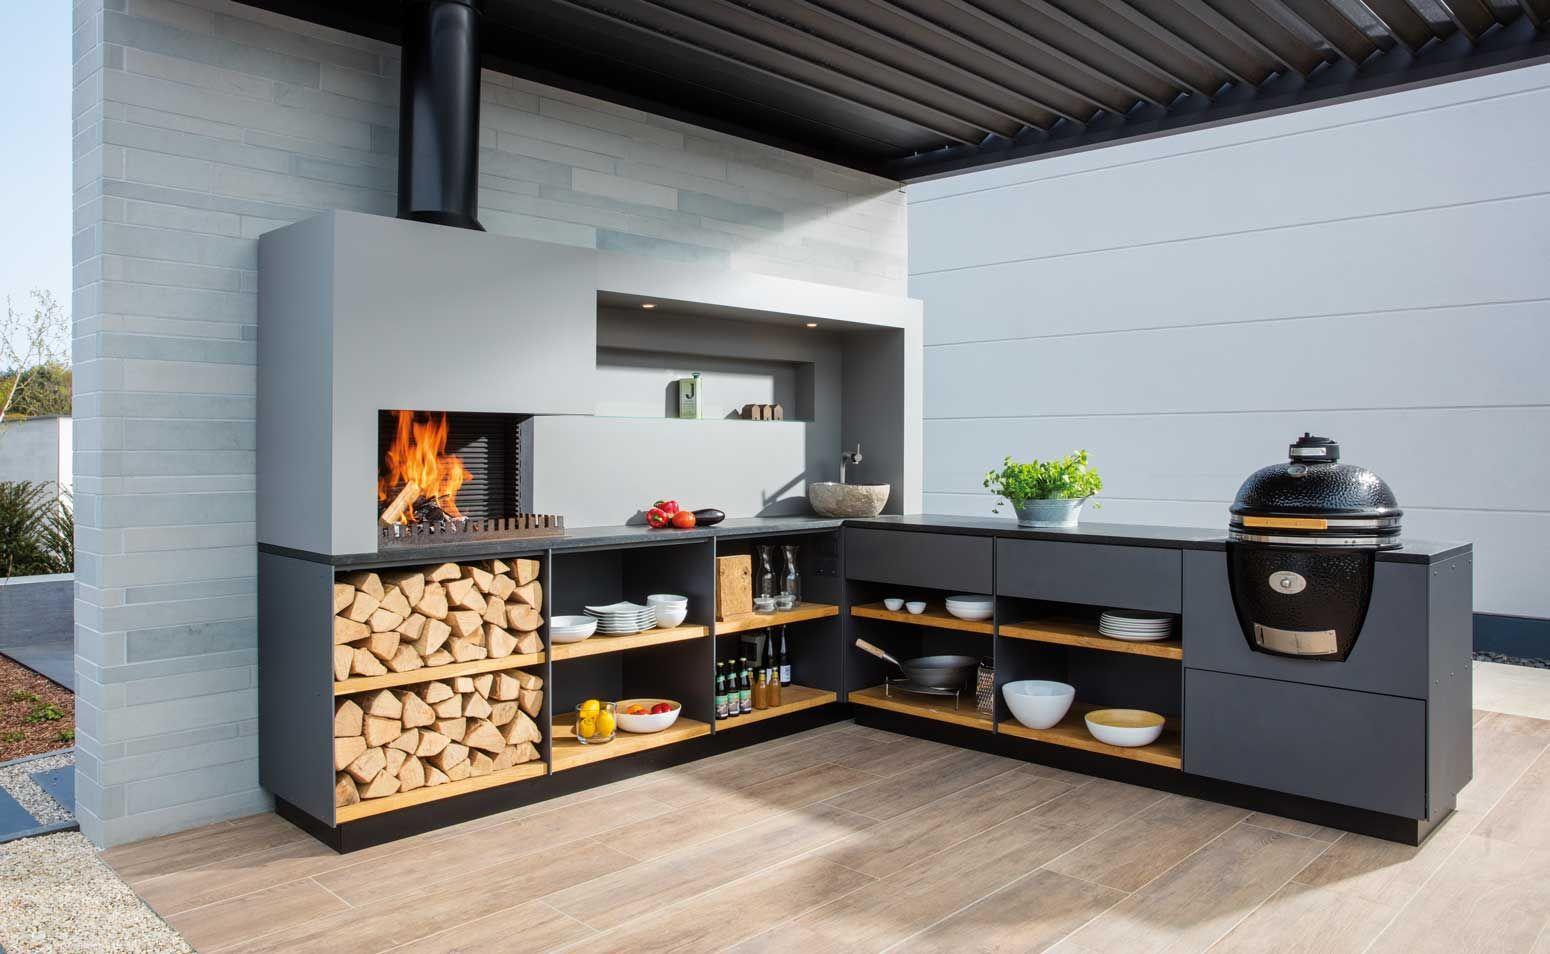 Buitenkeuken freiluftküche